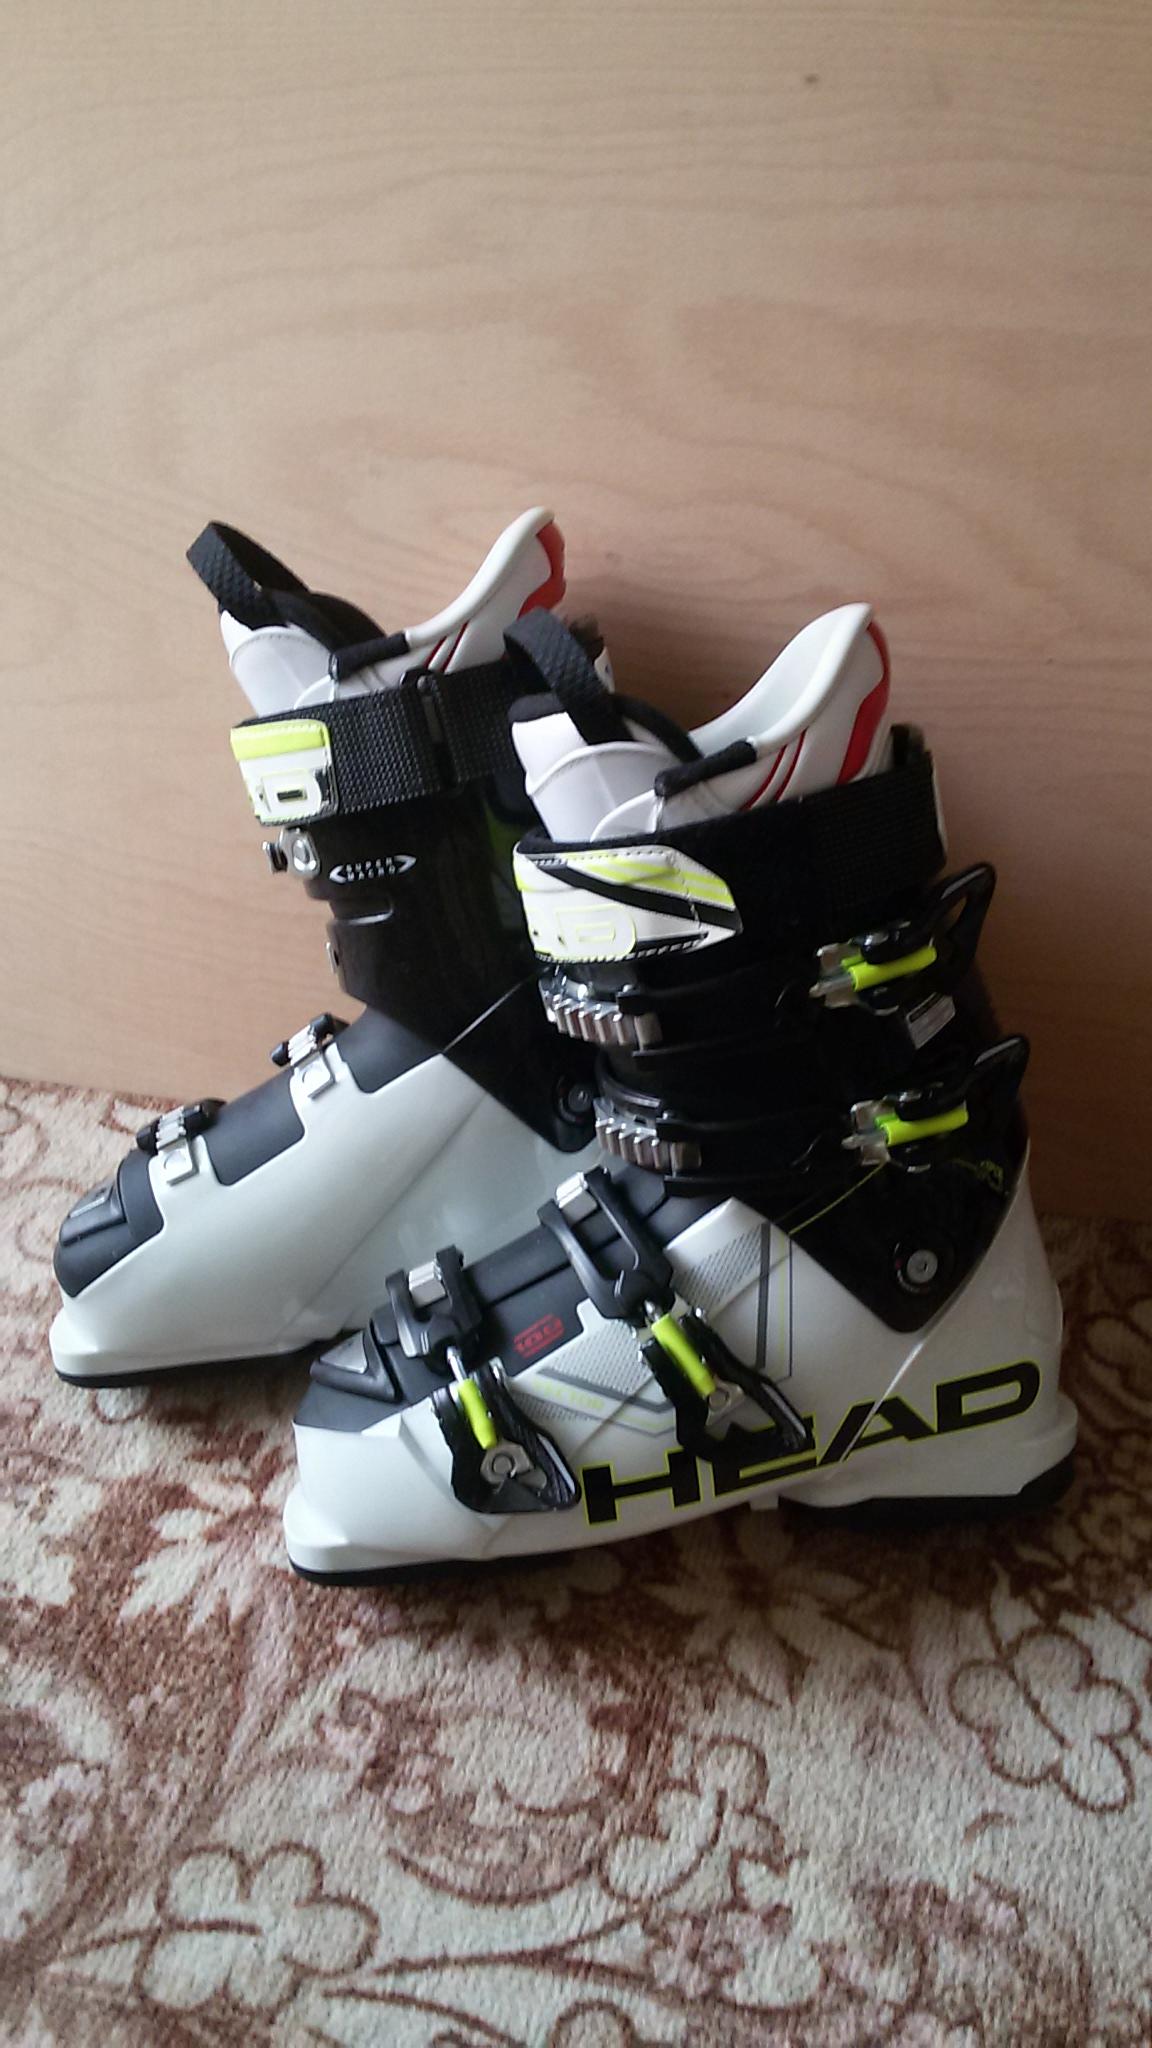 sjezdové boty Head Vector - Bazar - SNOW.CZ d563988038